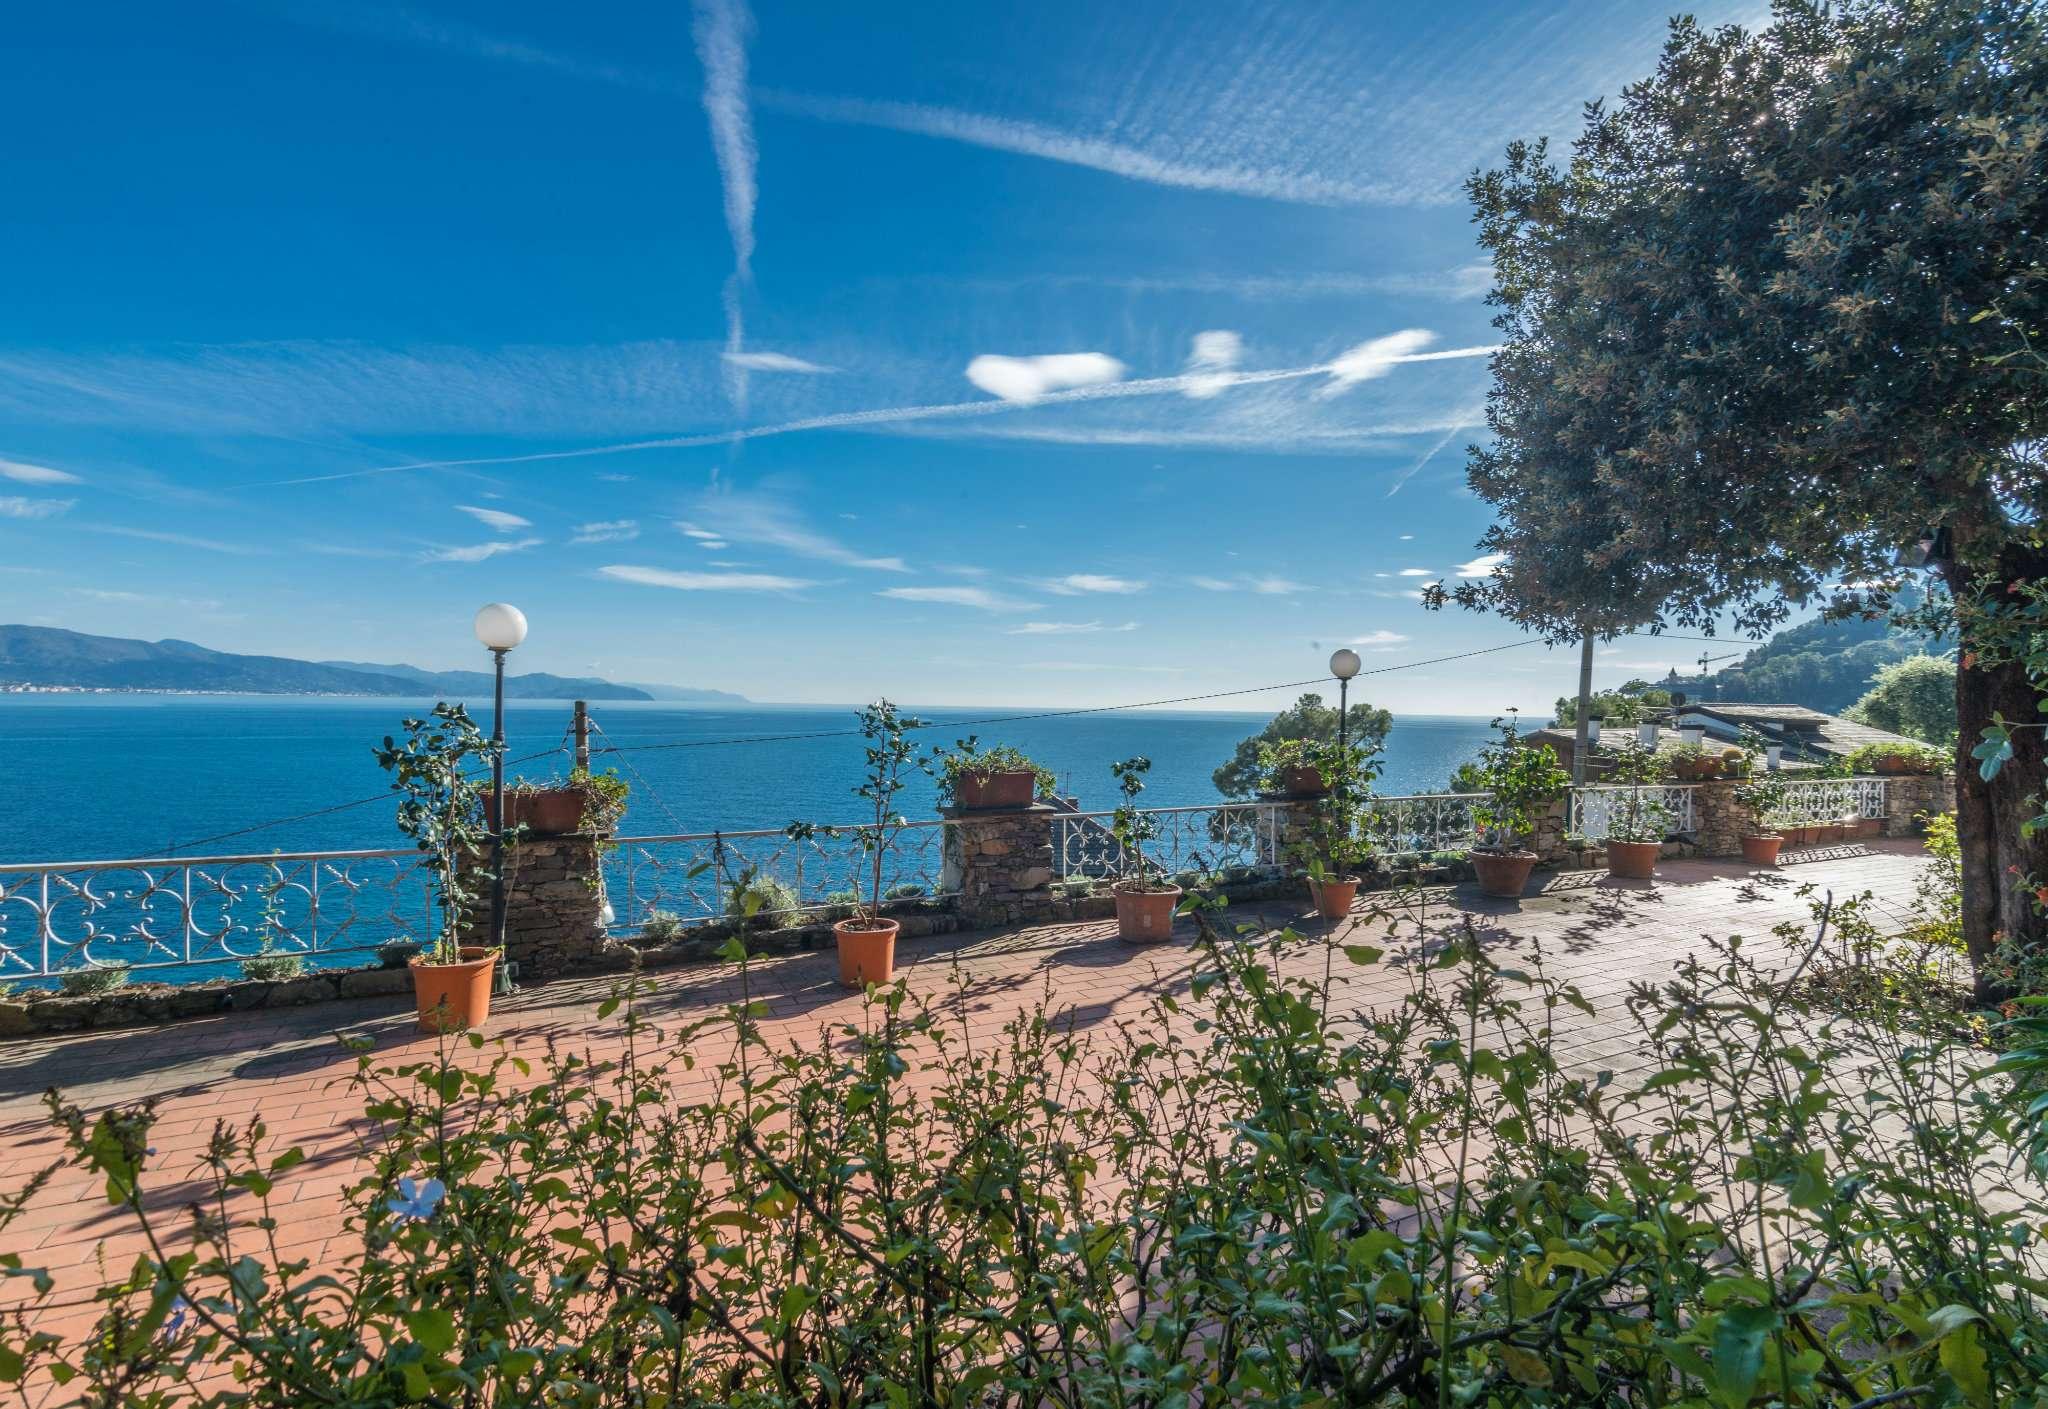 Villa in Vendita a Santa Margherita Ligure: 5 locali, 545 mq - Foto 6